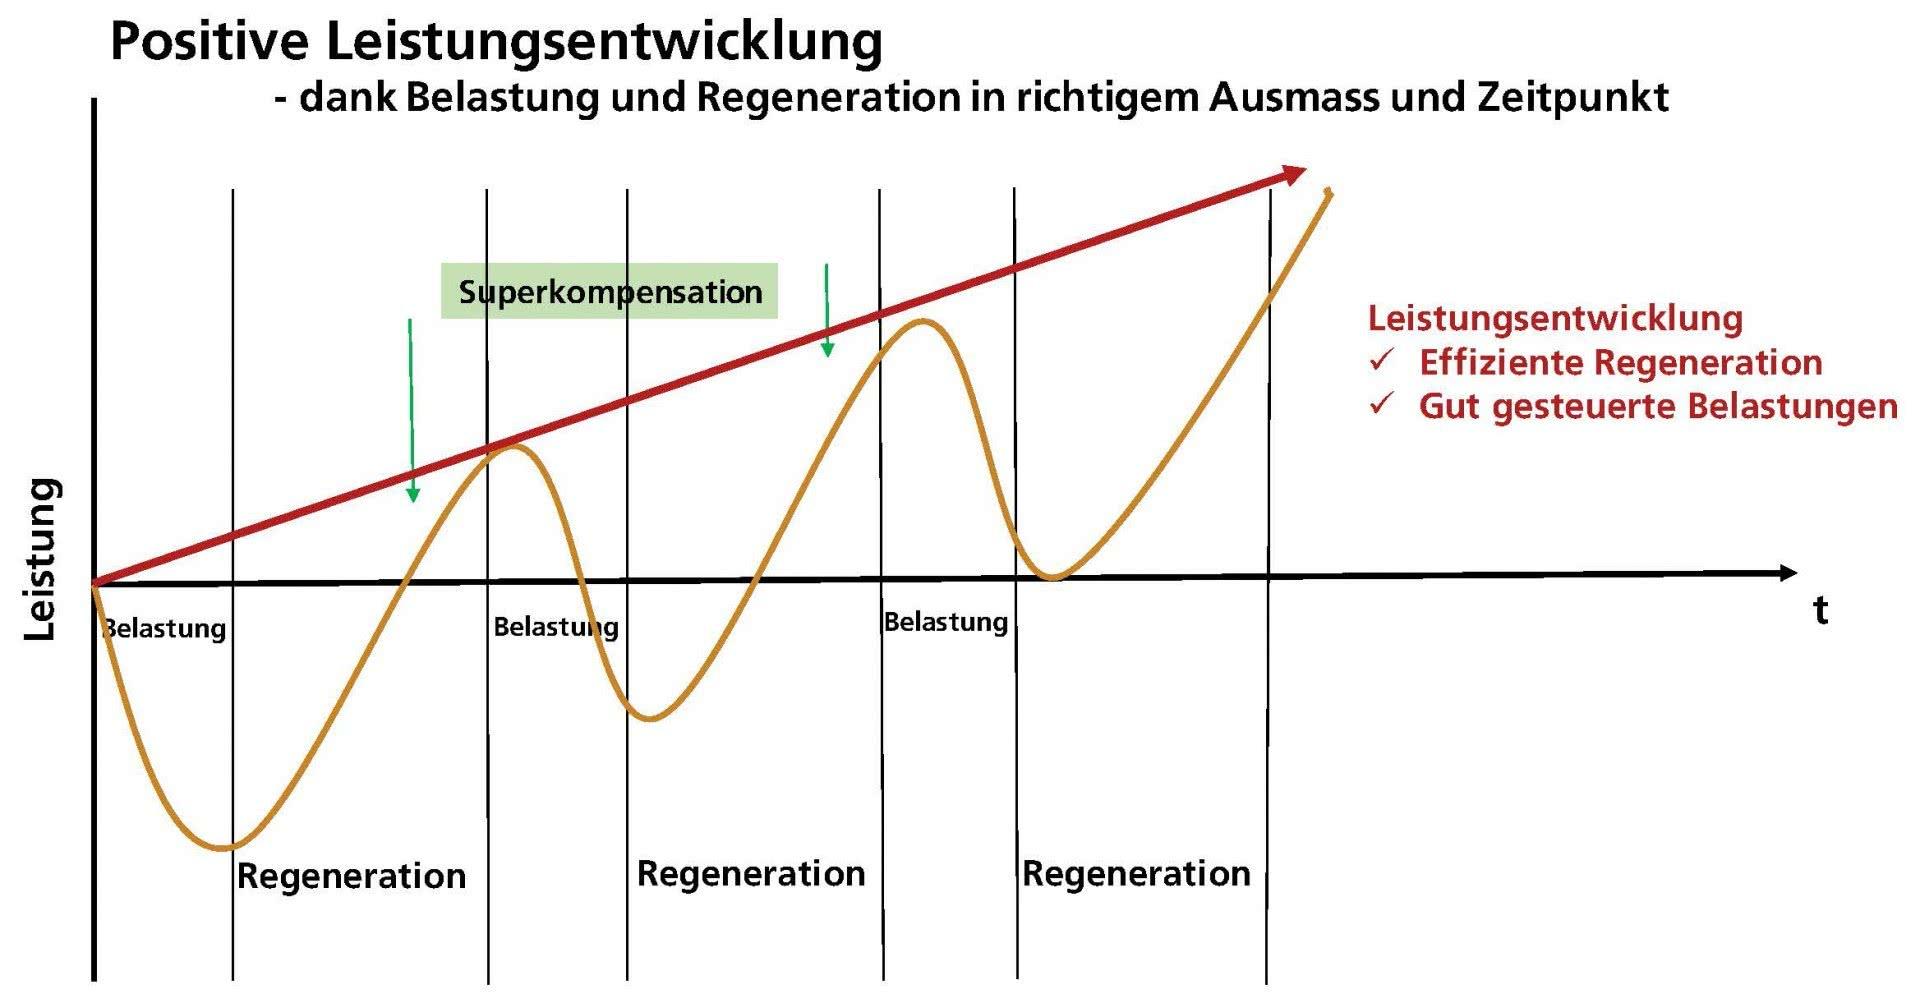 Grafik: positive Leistungsentwicklung.